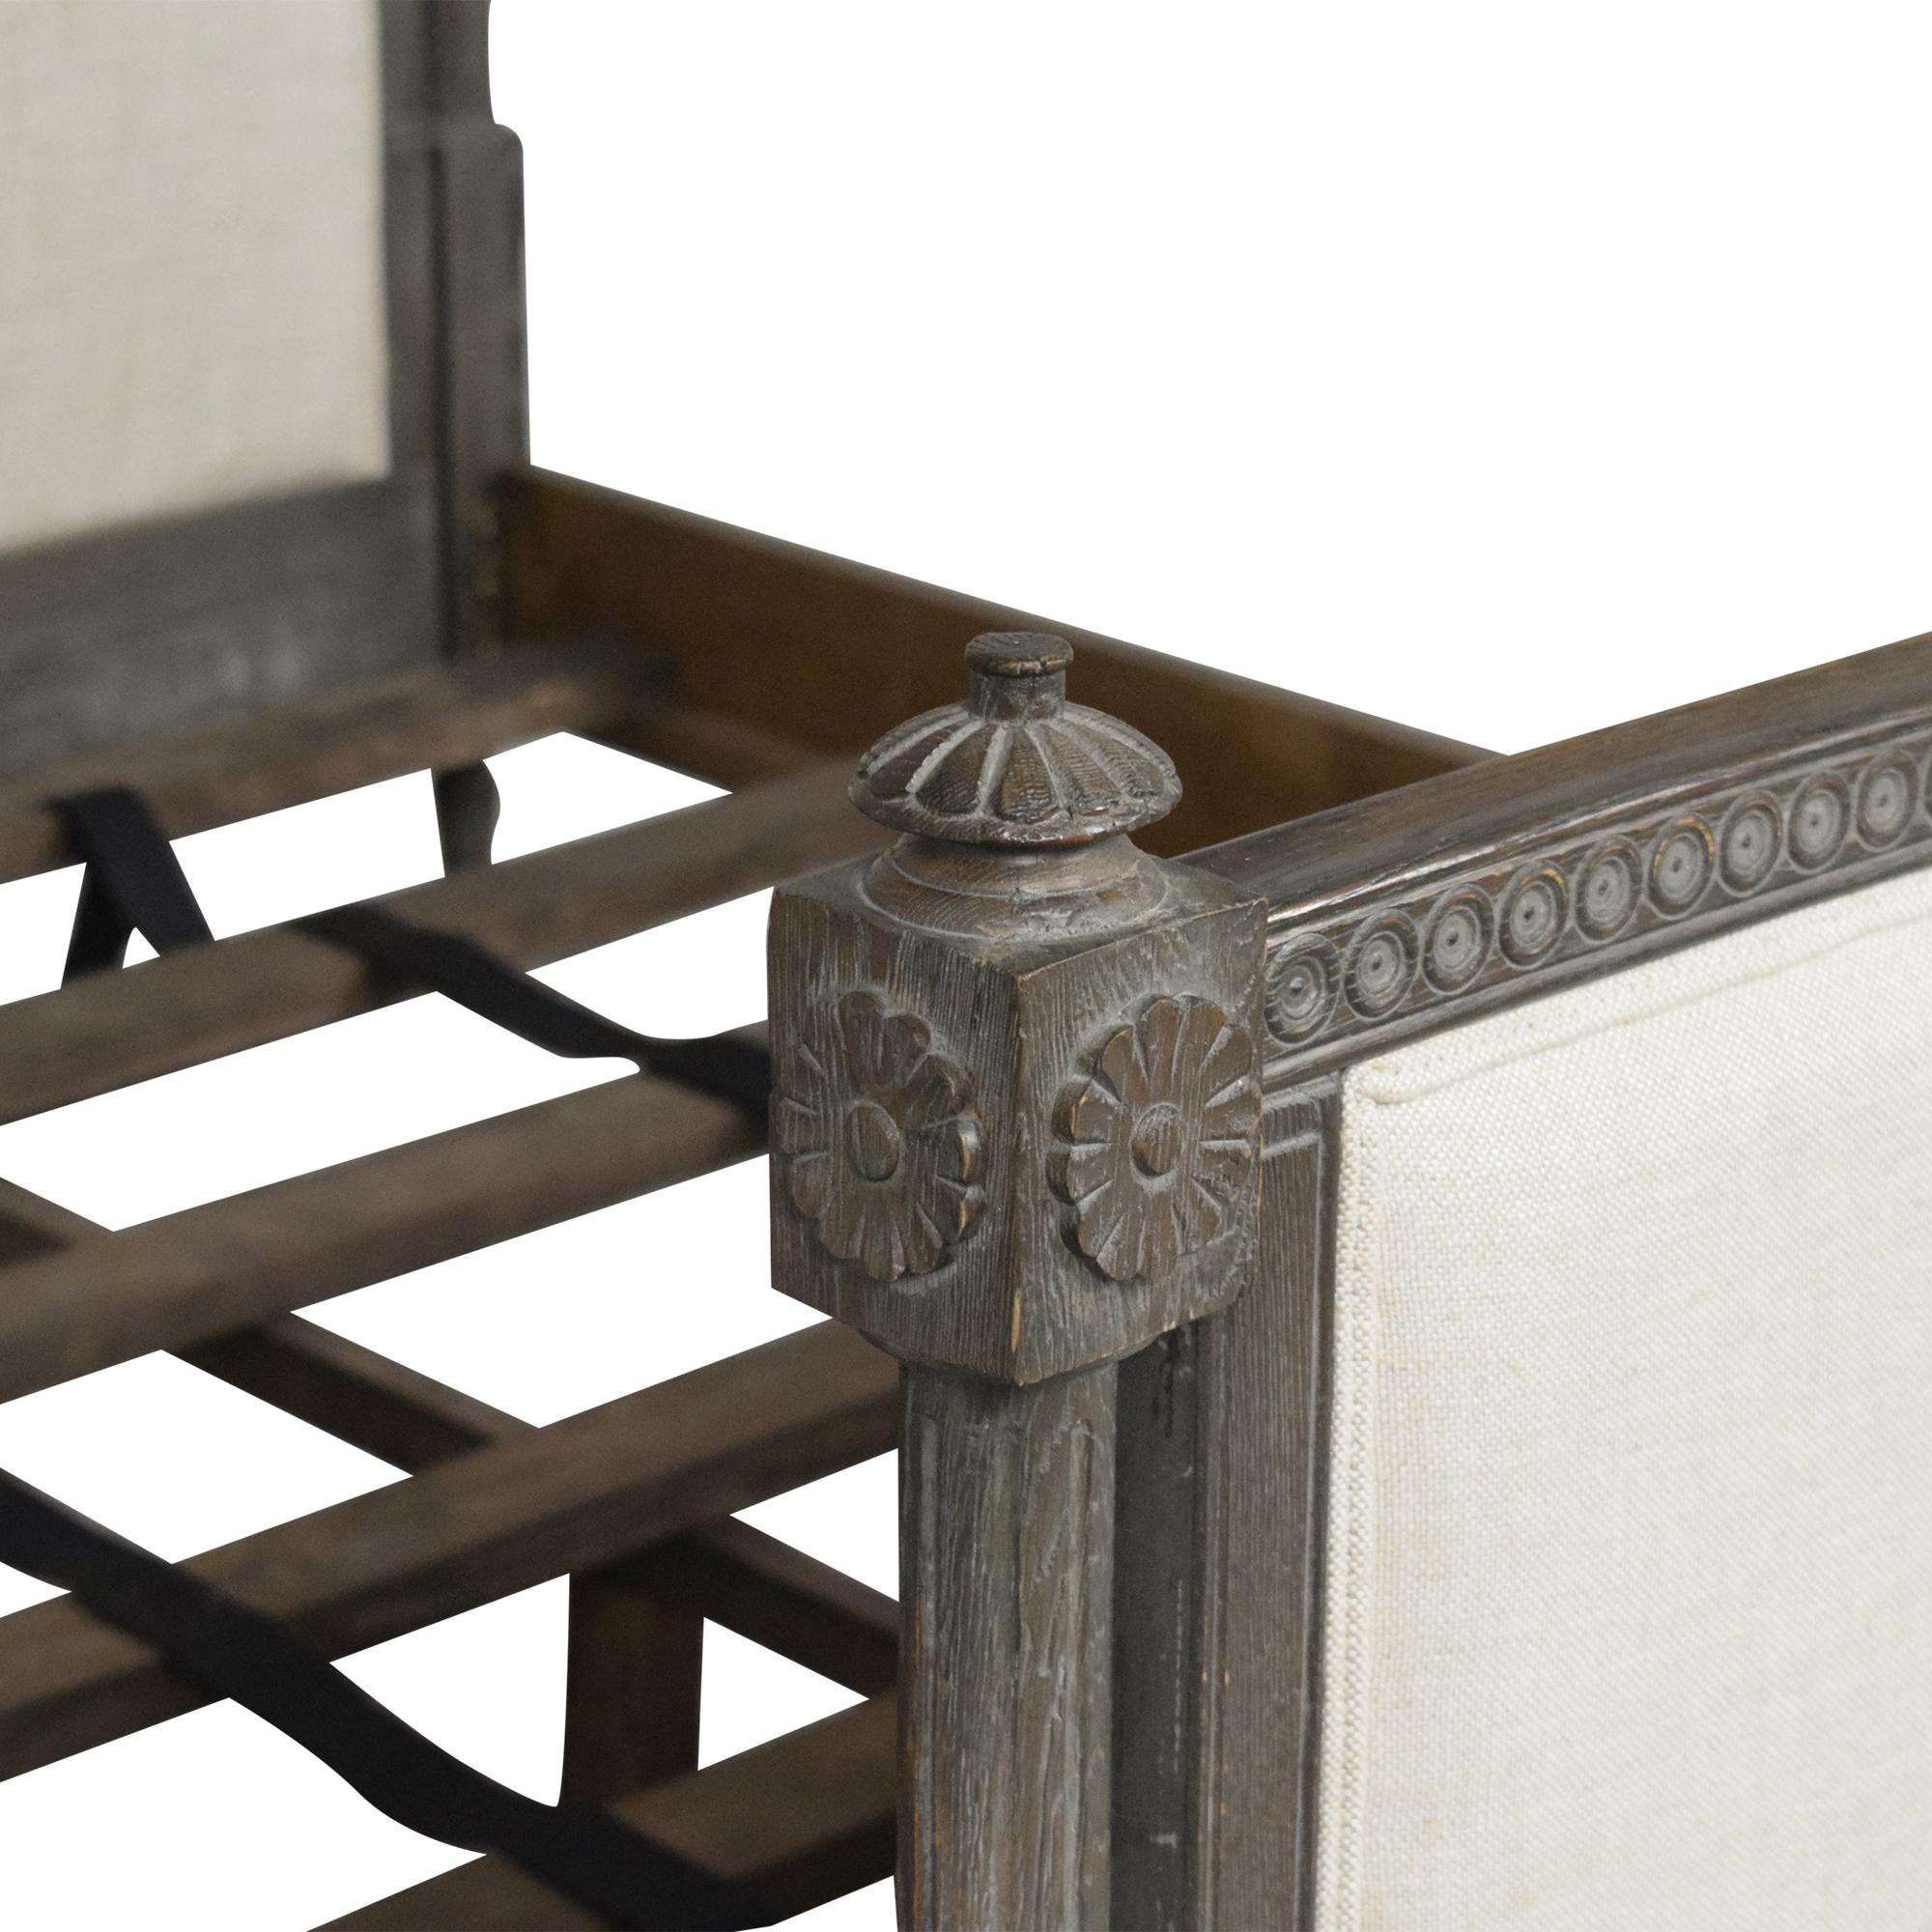 Restoration Hardware French-Style Upholstered Queen Bed Restoration Hardware